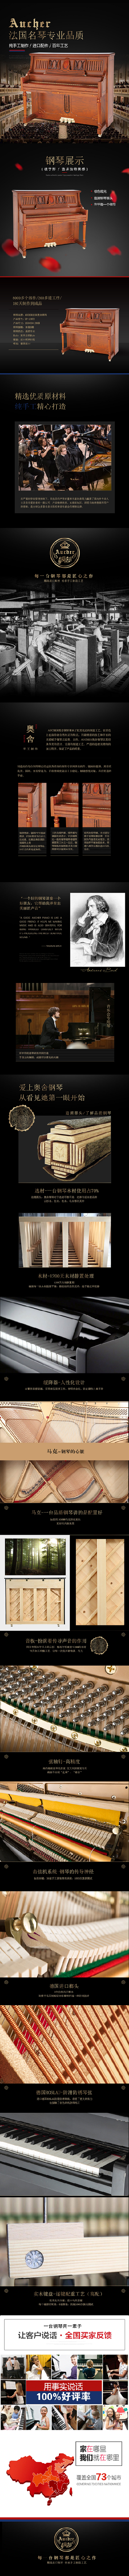 UP-126Y2 - 奥舍钢琴UP系列 - 法国奥舍Aucher钢琴官方网站.png